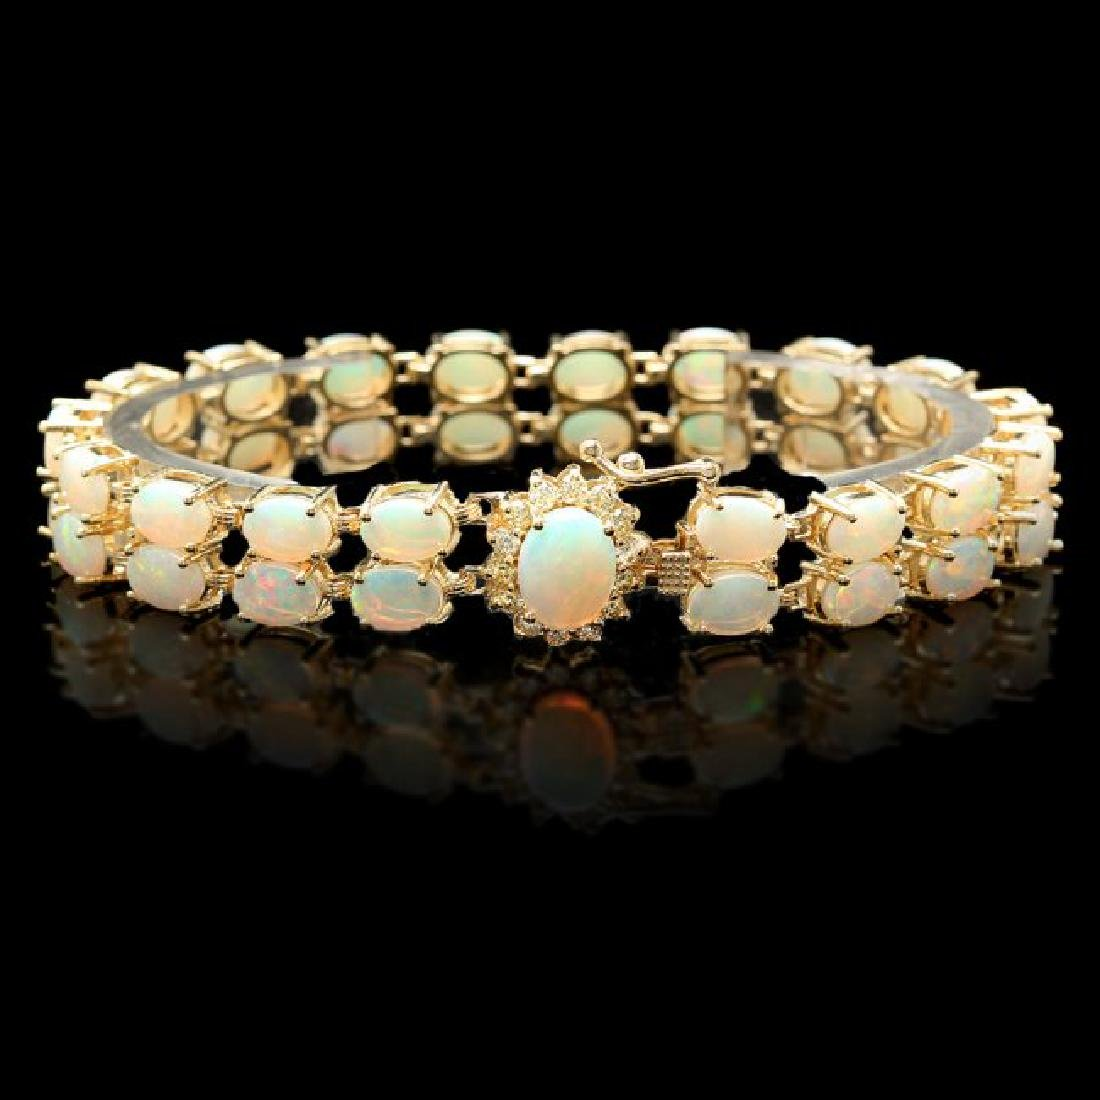 14k Gold 14.1ct Opal 0.50ct Diamond Bracelet